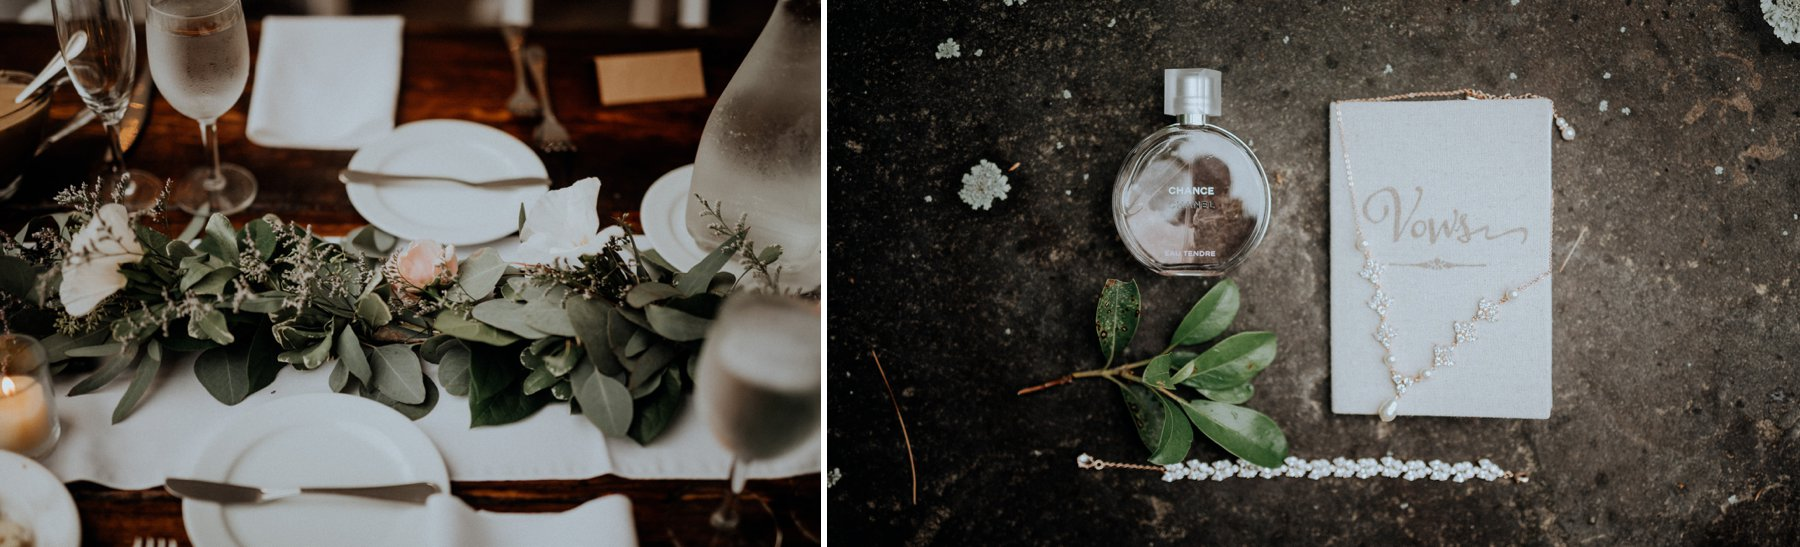 233-231-tyler-arboretum-wedding-24.jpg